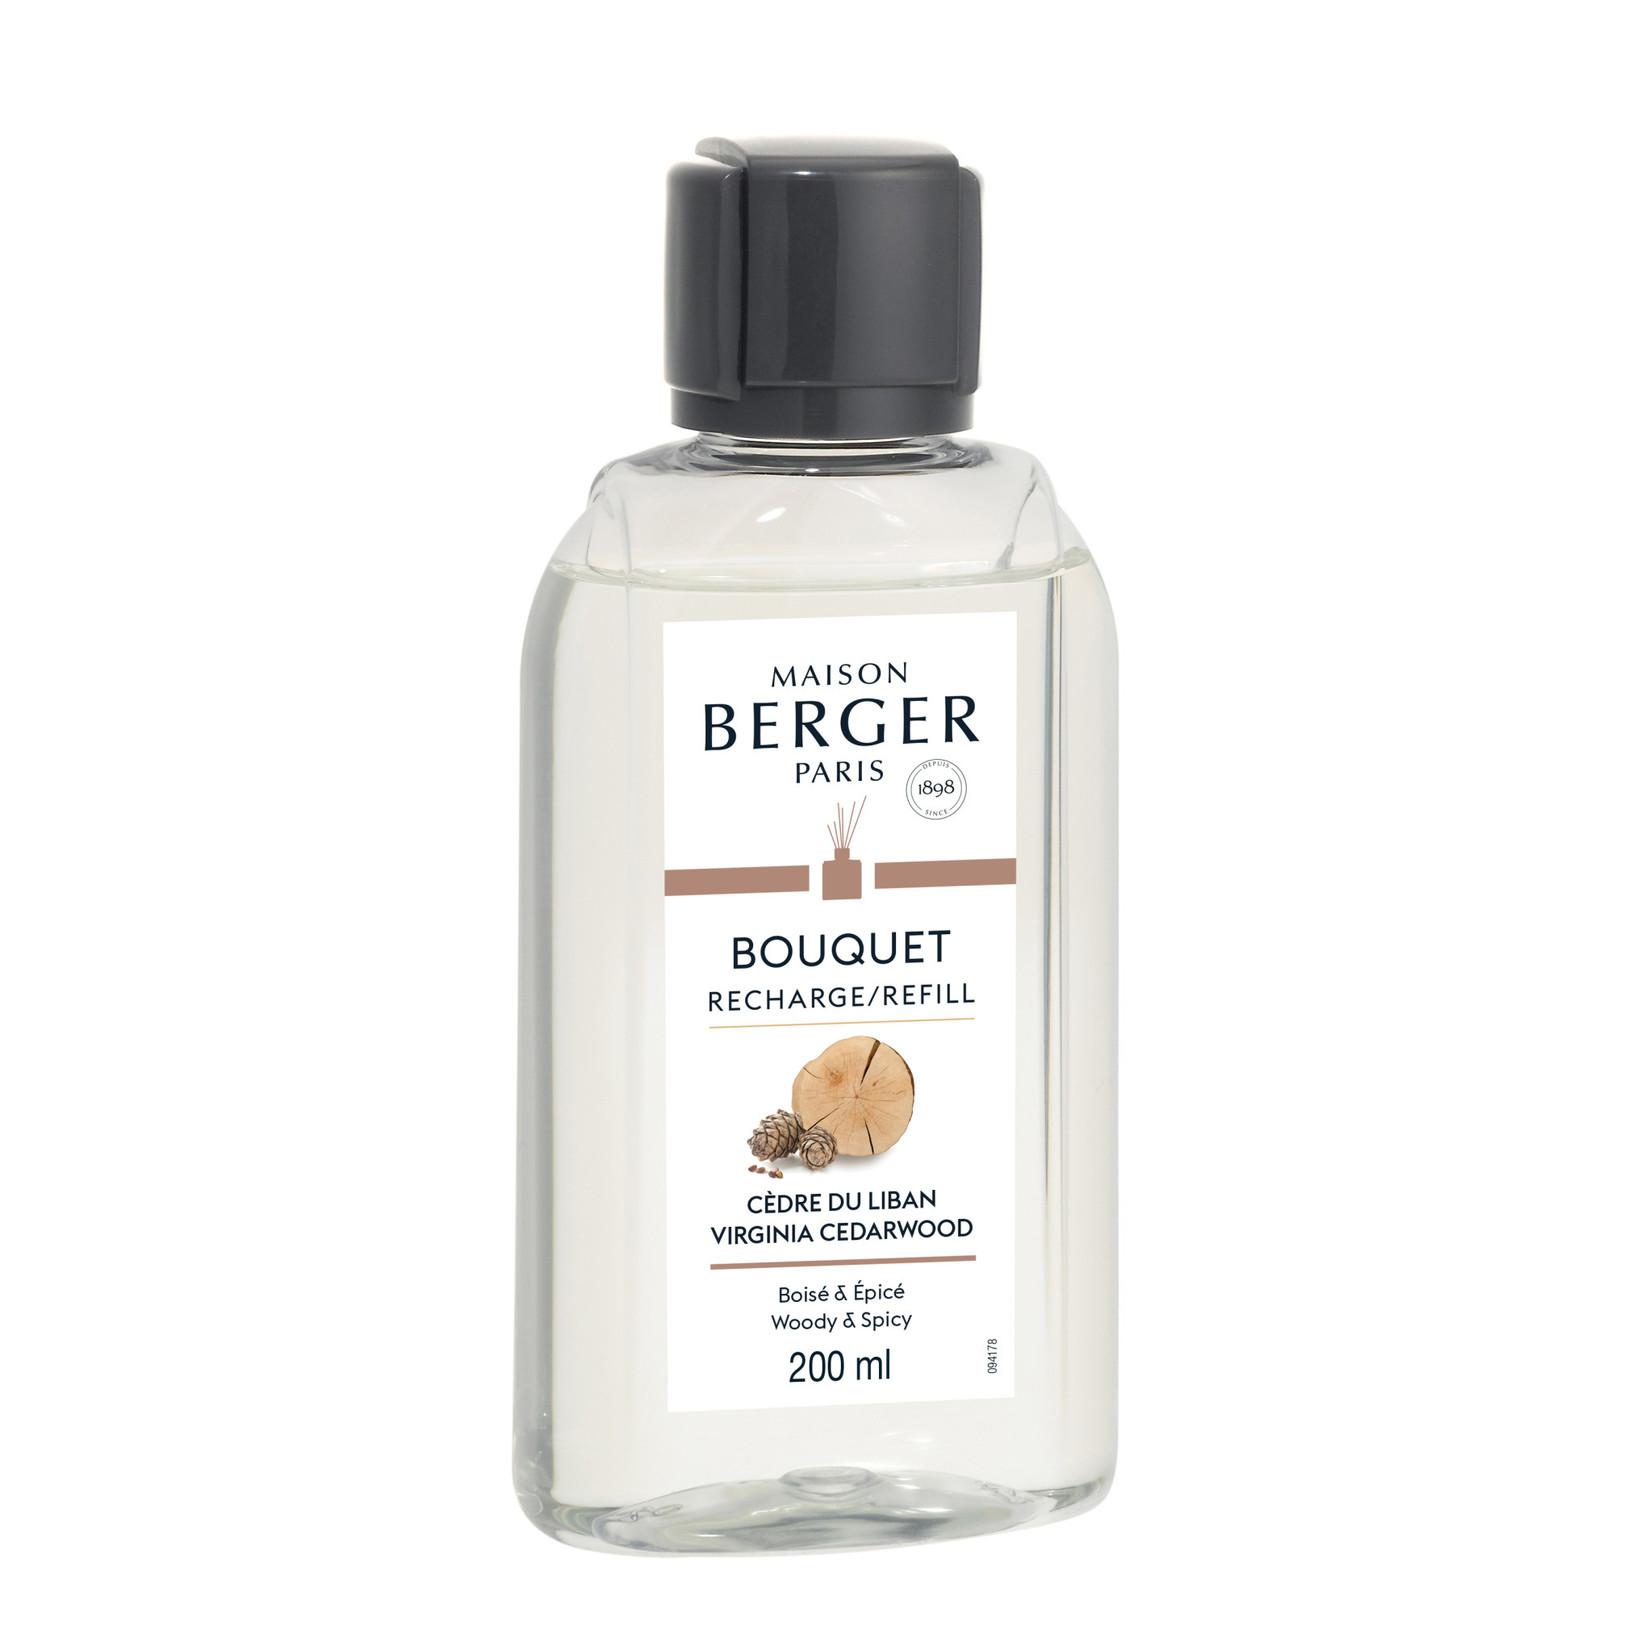 Lampe Berger Navulling parfumverspreider 200ml Cèdre du liban